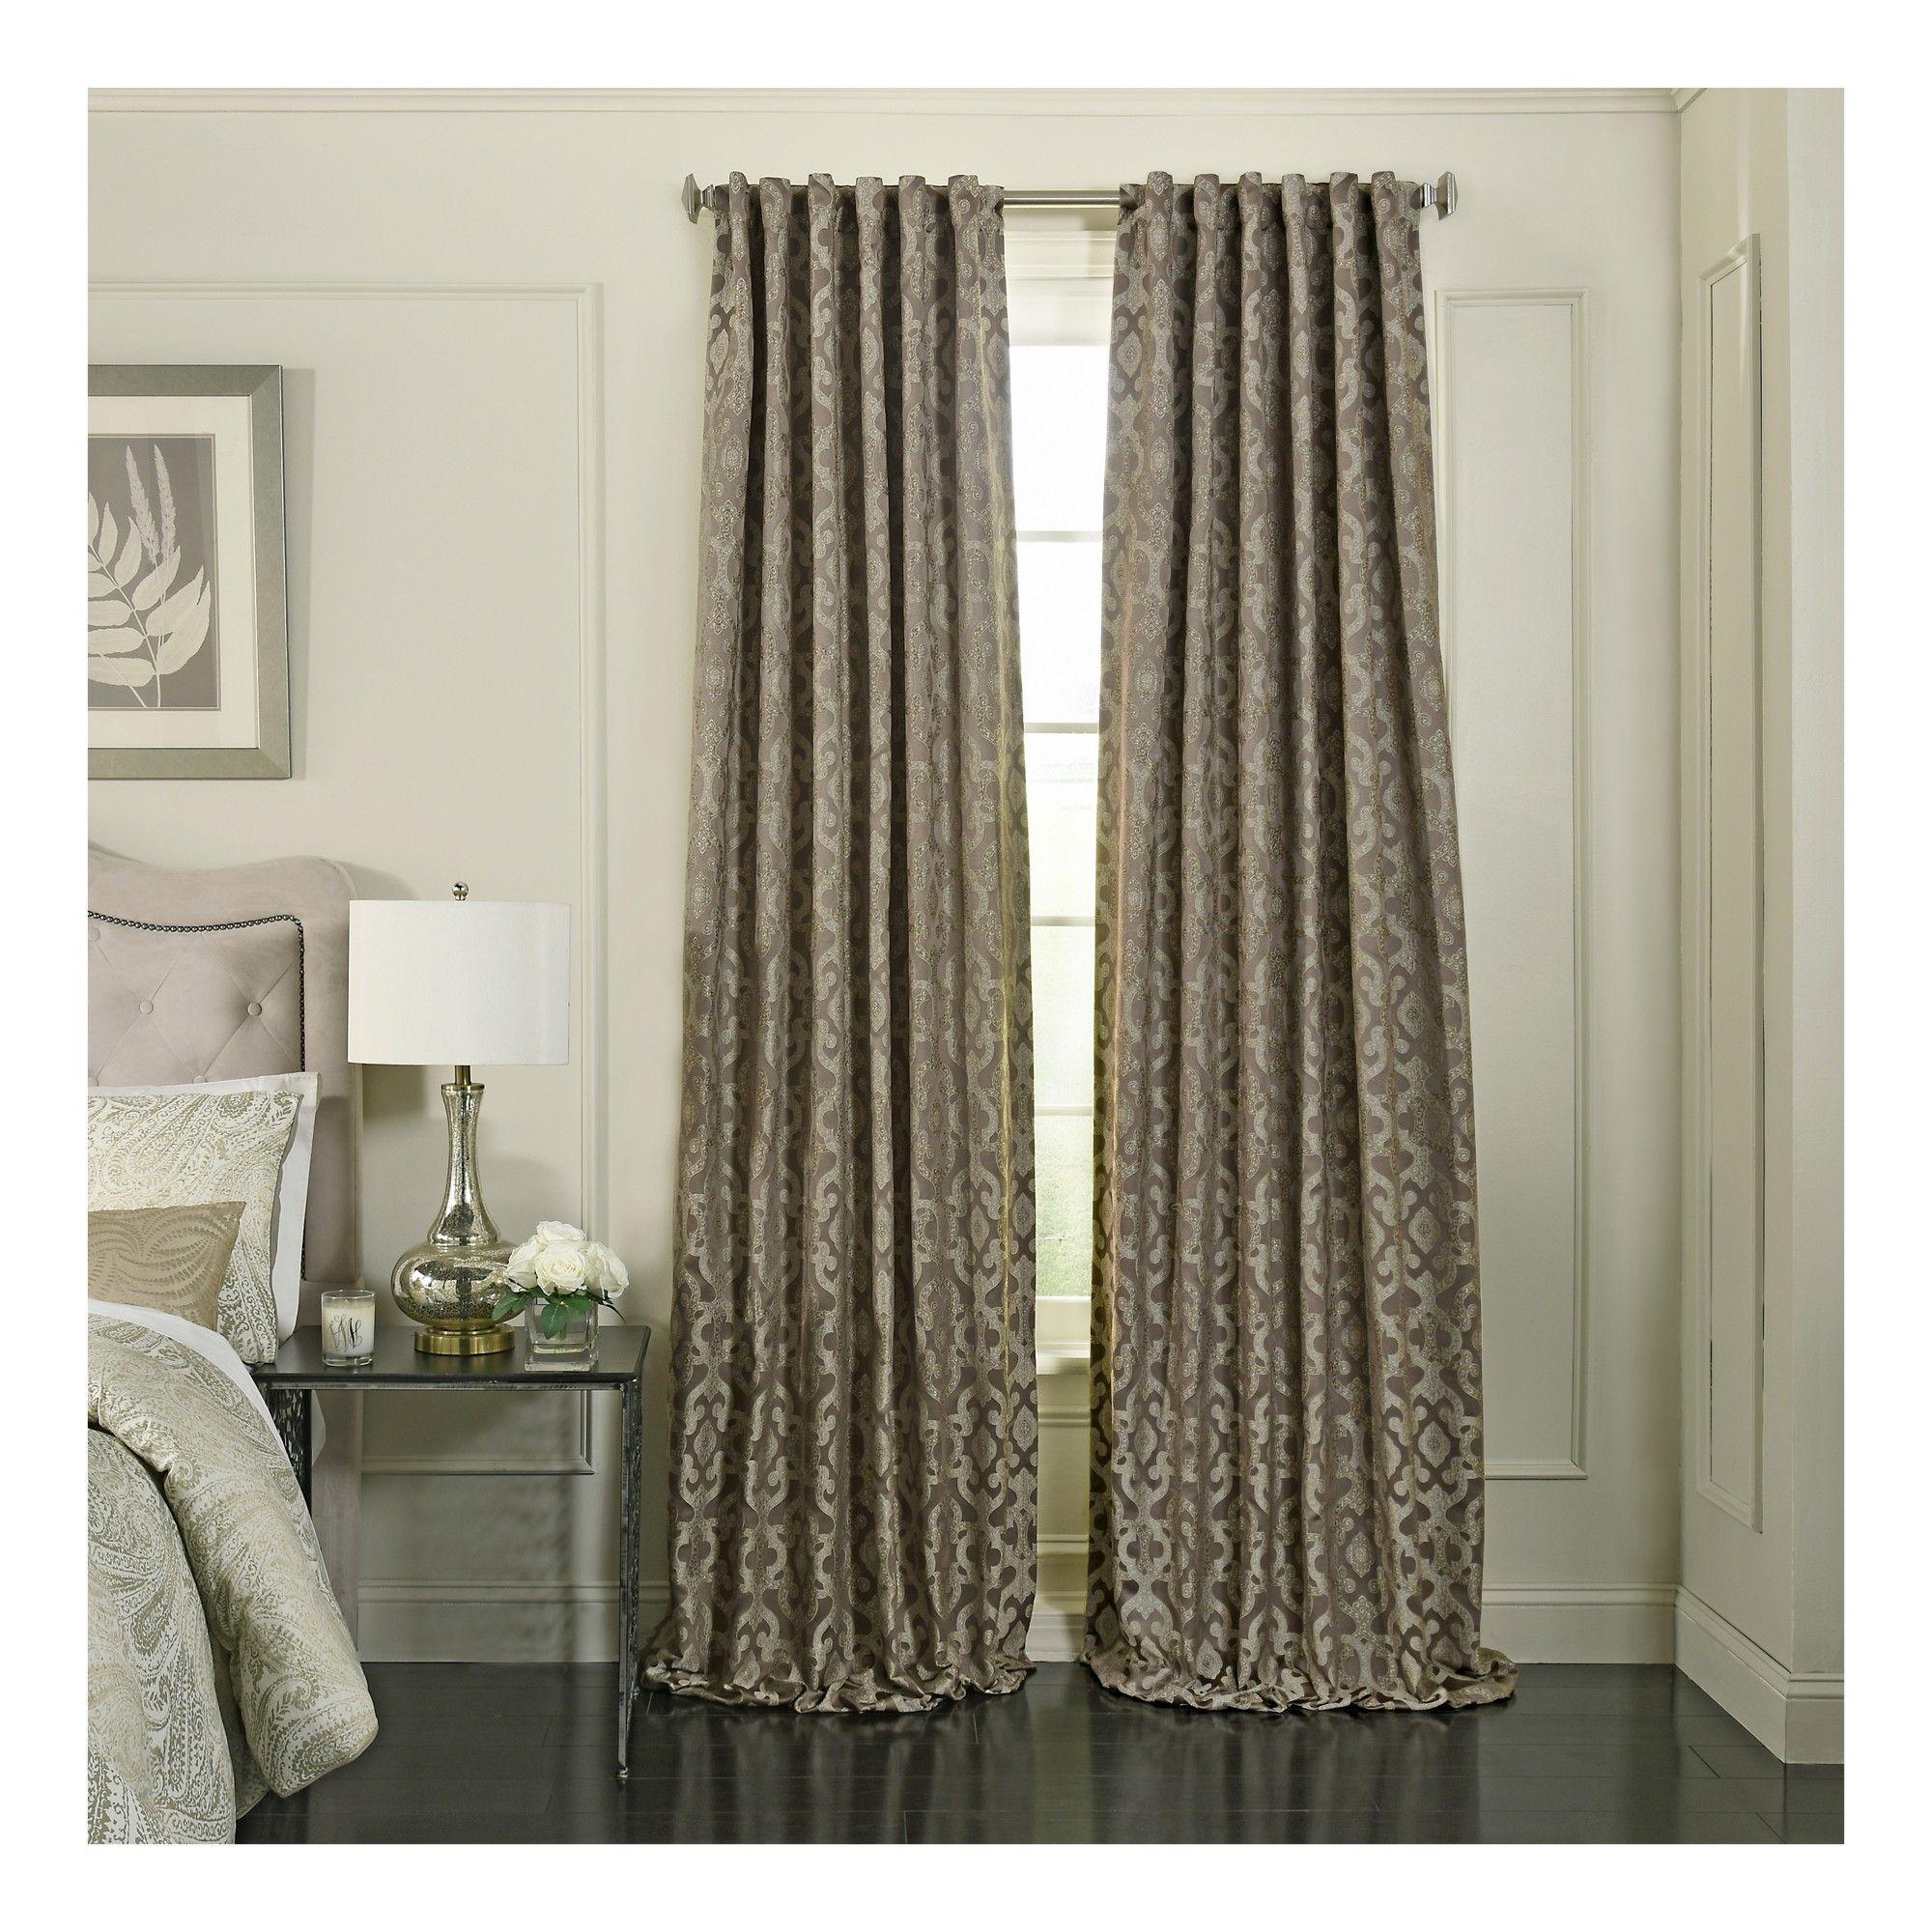 Beautyrest normandy blackout window curtain mushroom browntrellis